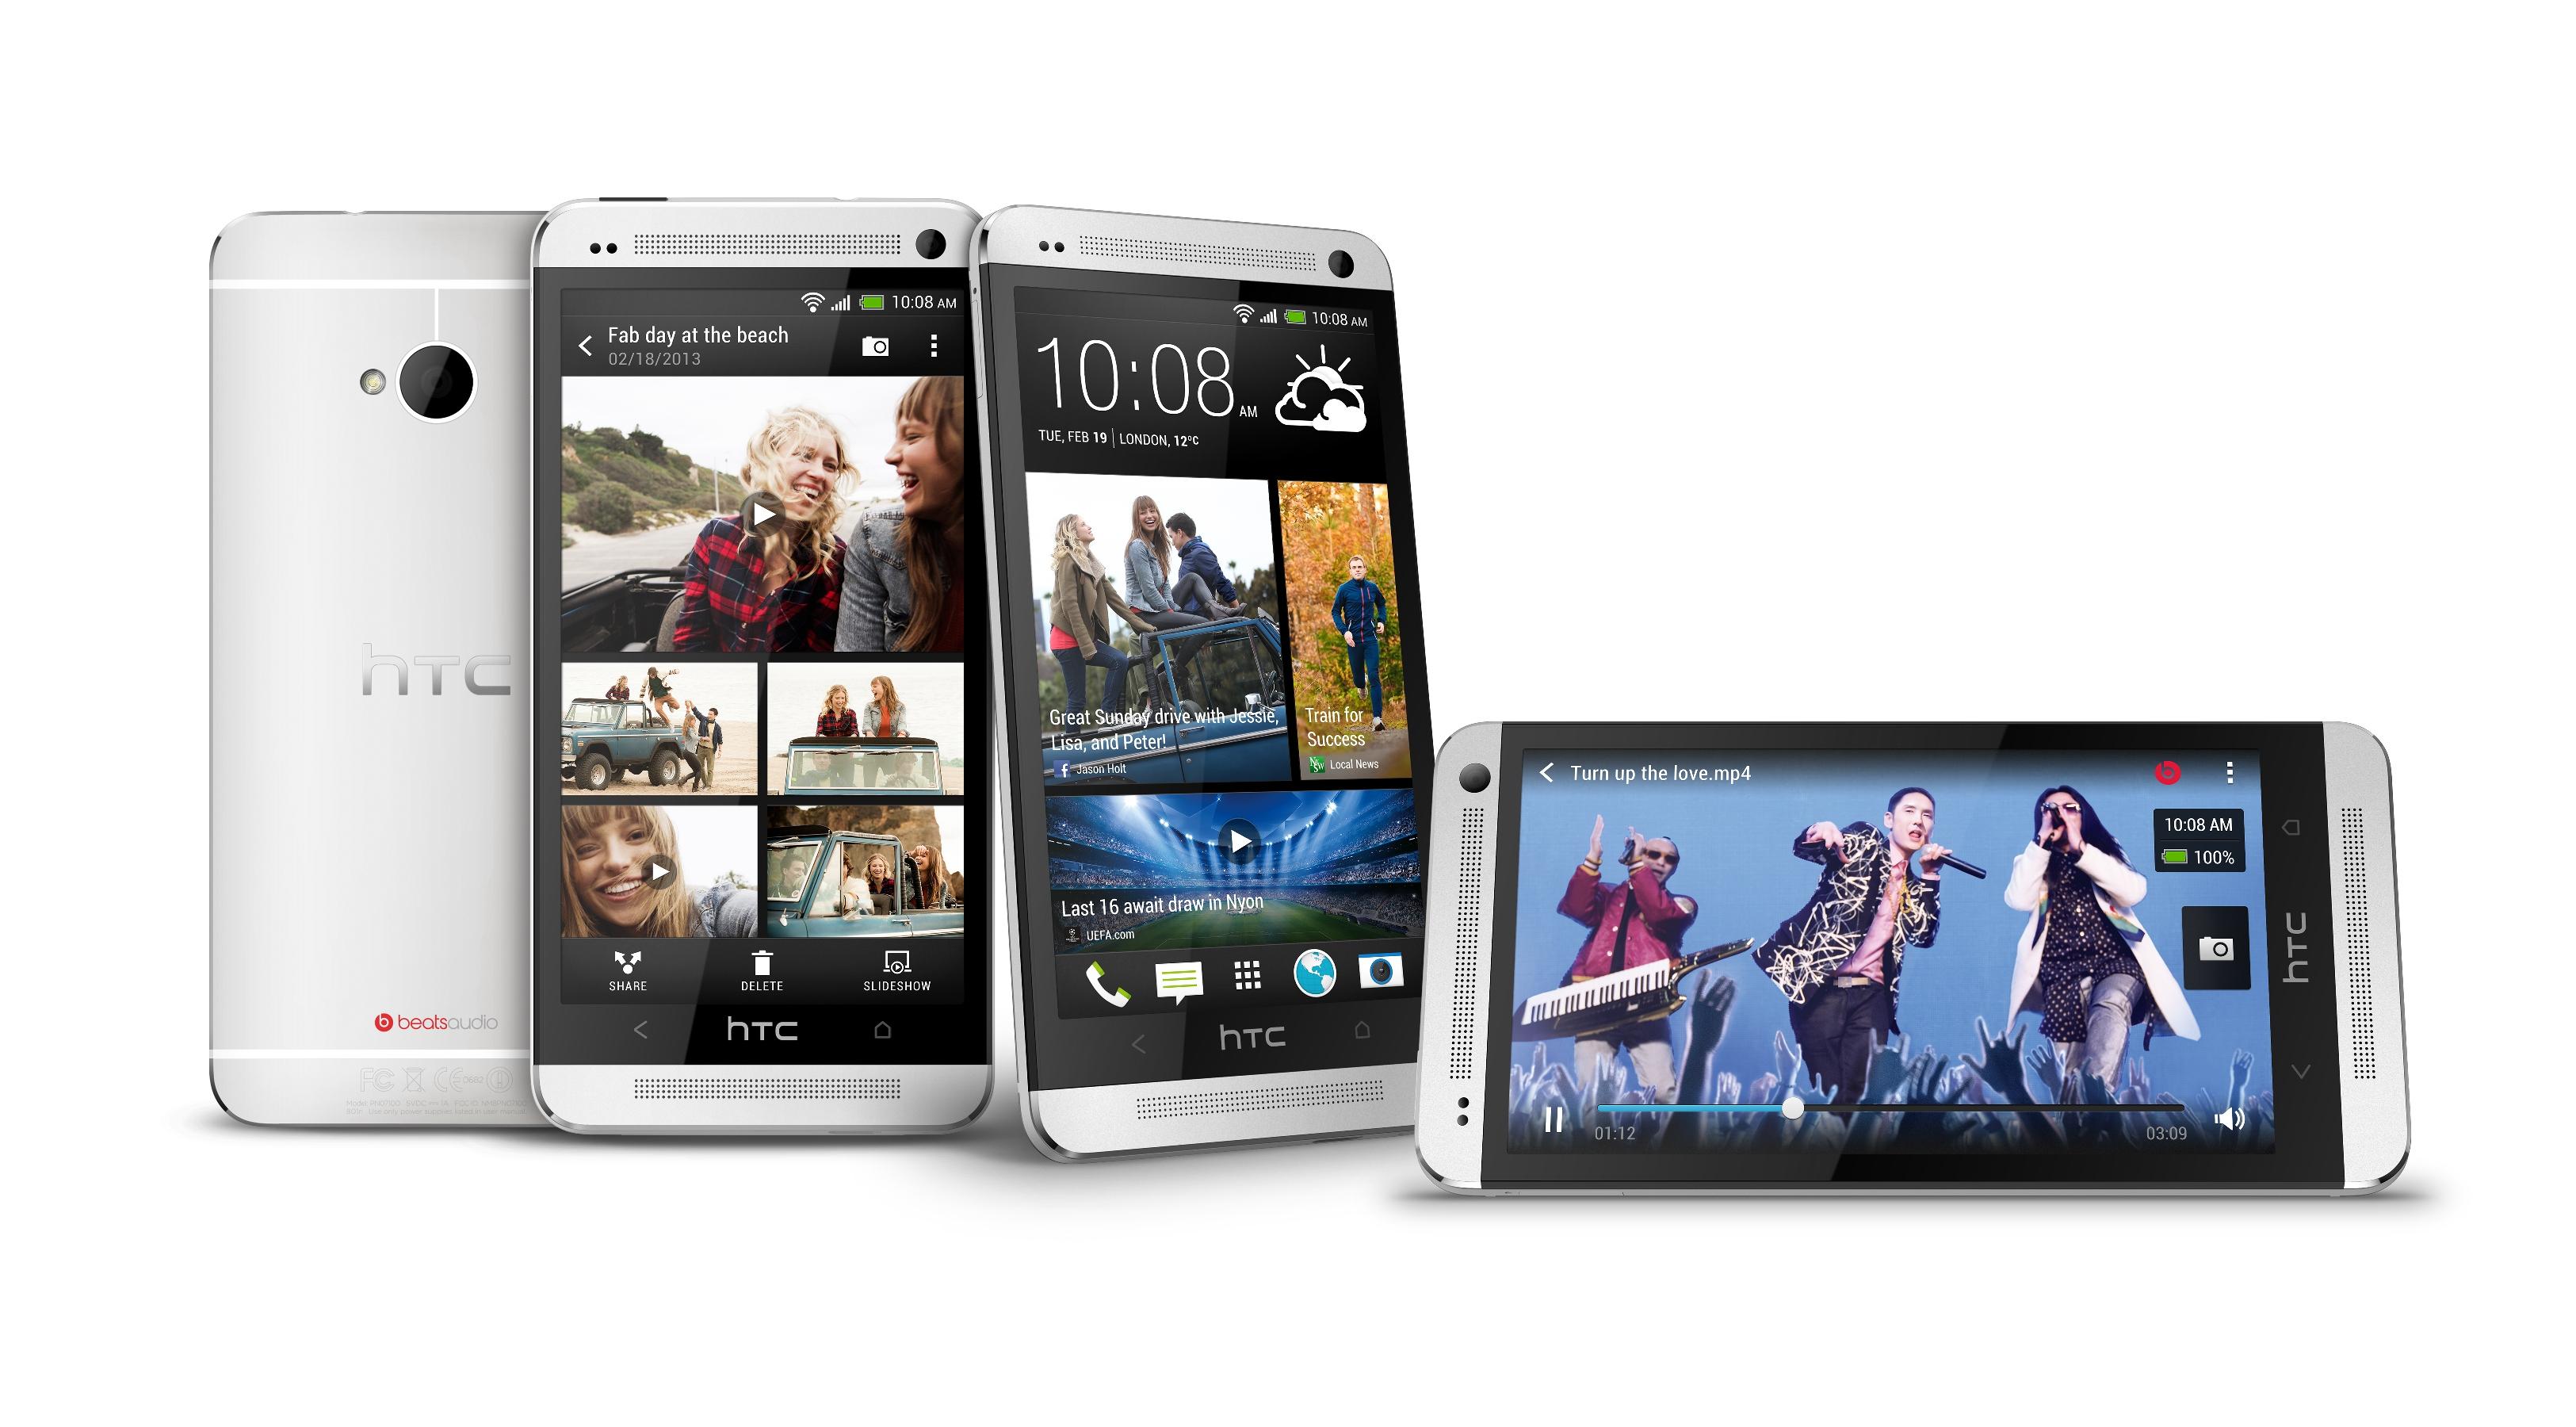 HTC One สีแดง - Omega Gadget 8